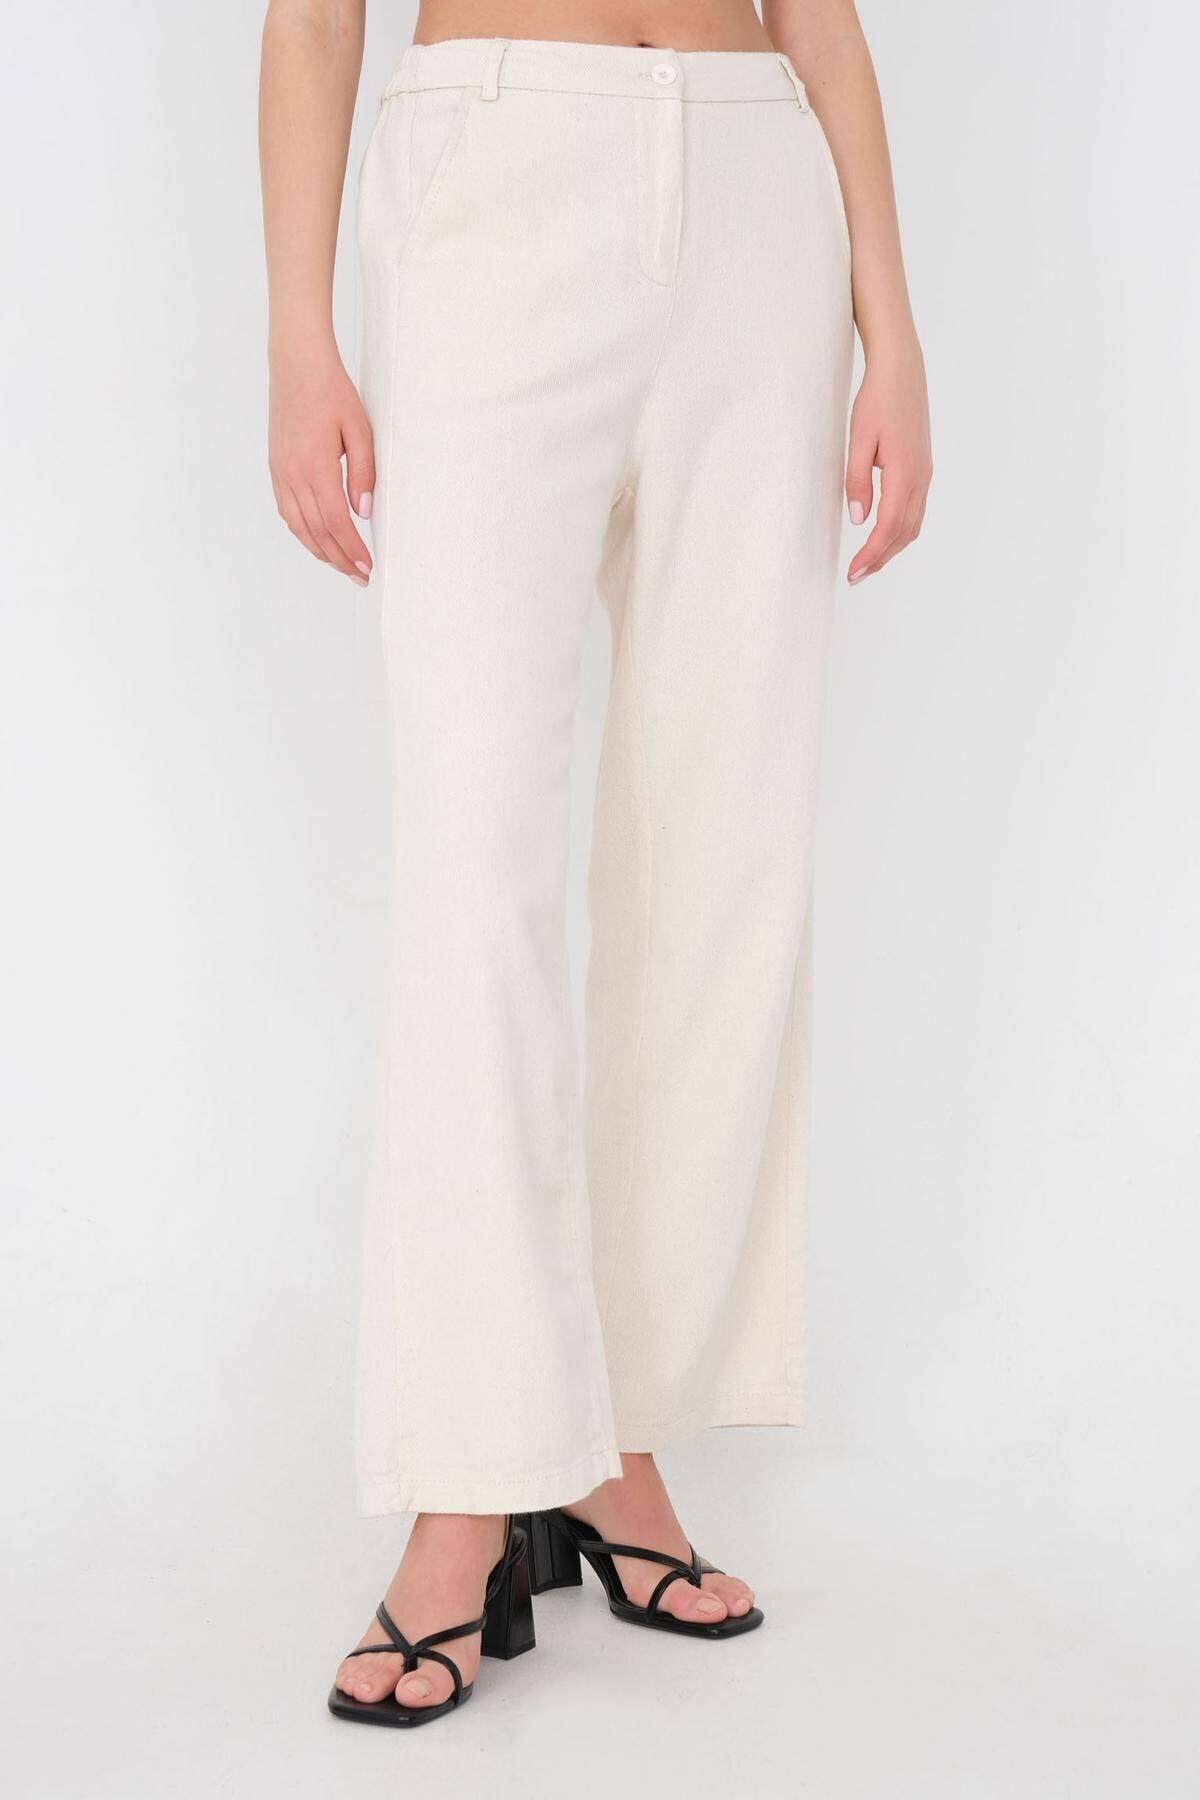 Addax Kadın Taş Bol Paça Pantolon Pn03-0034 - İ2 Adx-0000024276